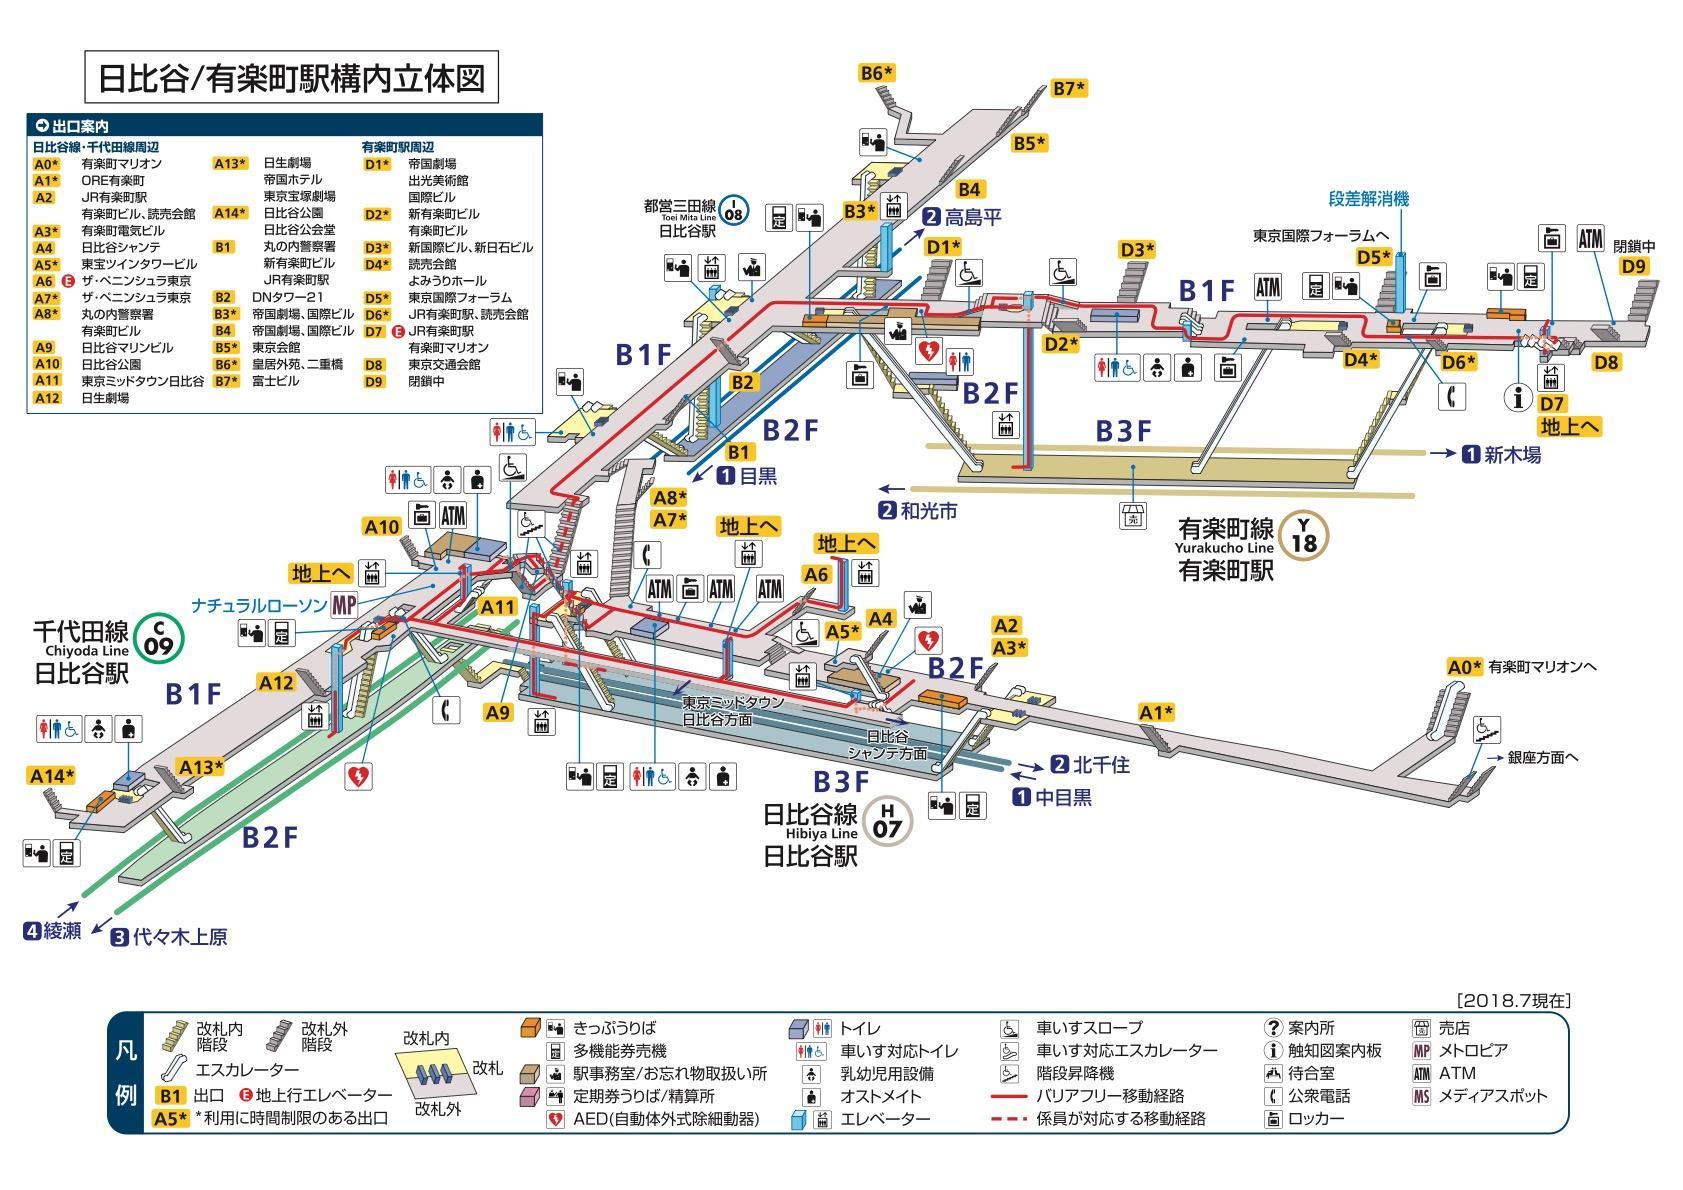 https://www.tokyometro.jp/station/yardmap_img/_station_%E6%97%A5%E6%AF%94%E8%B0%B7%E6%9C%89%E6%A5%BD%E7%94%BA_yardmap_images_yardmap.jpg